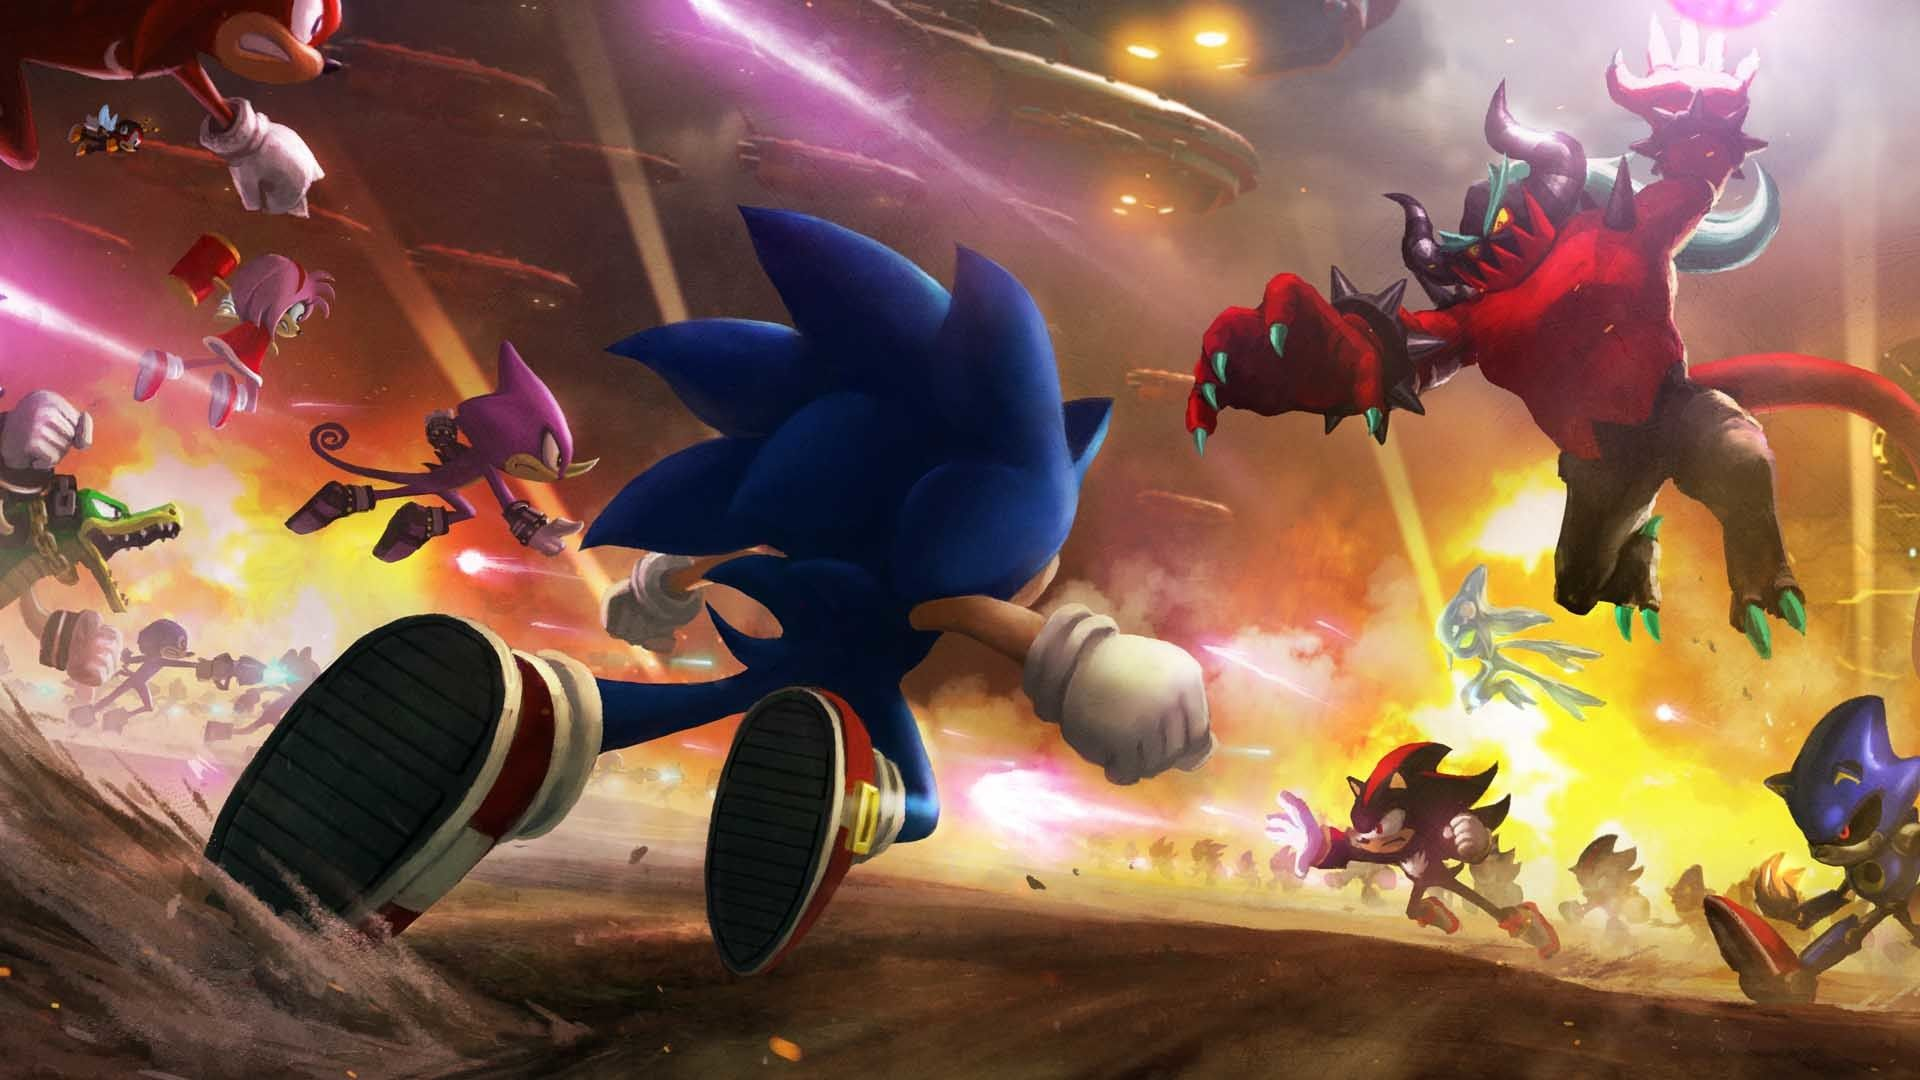 Sonic Wallpaper HD for Desktop download free